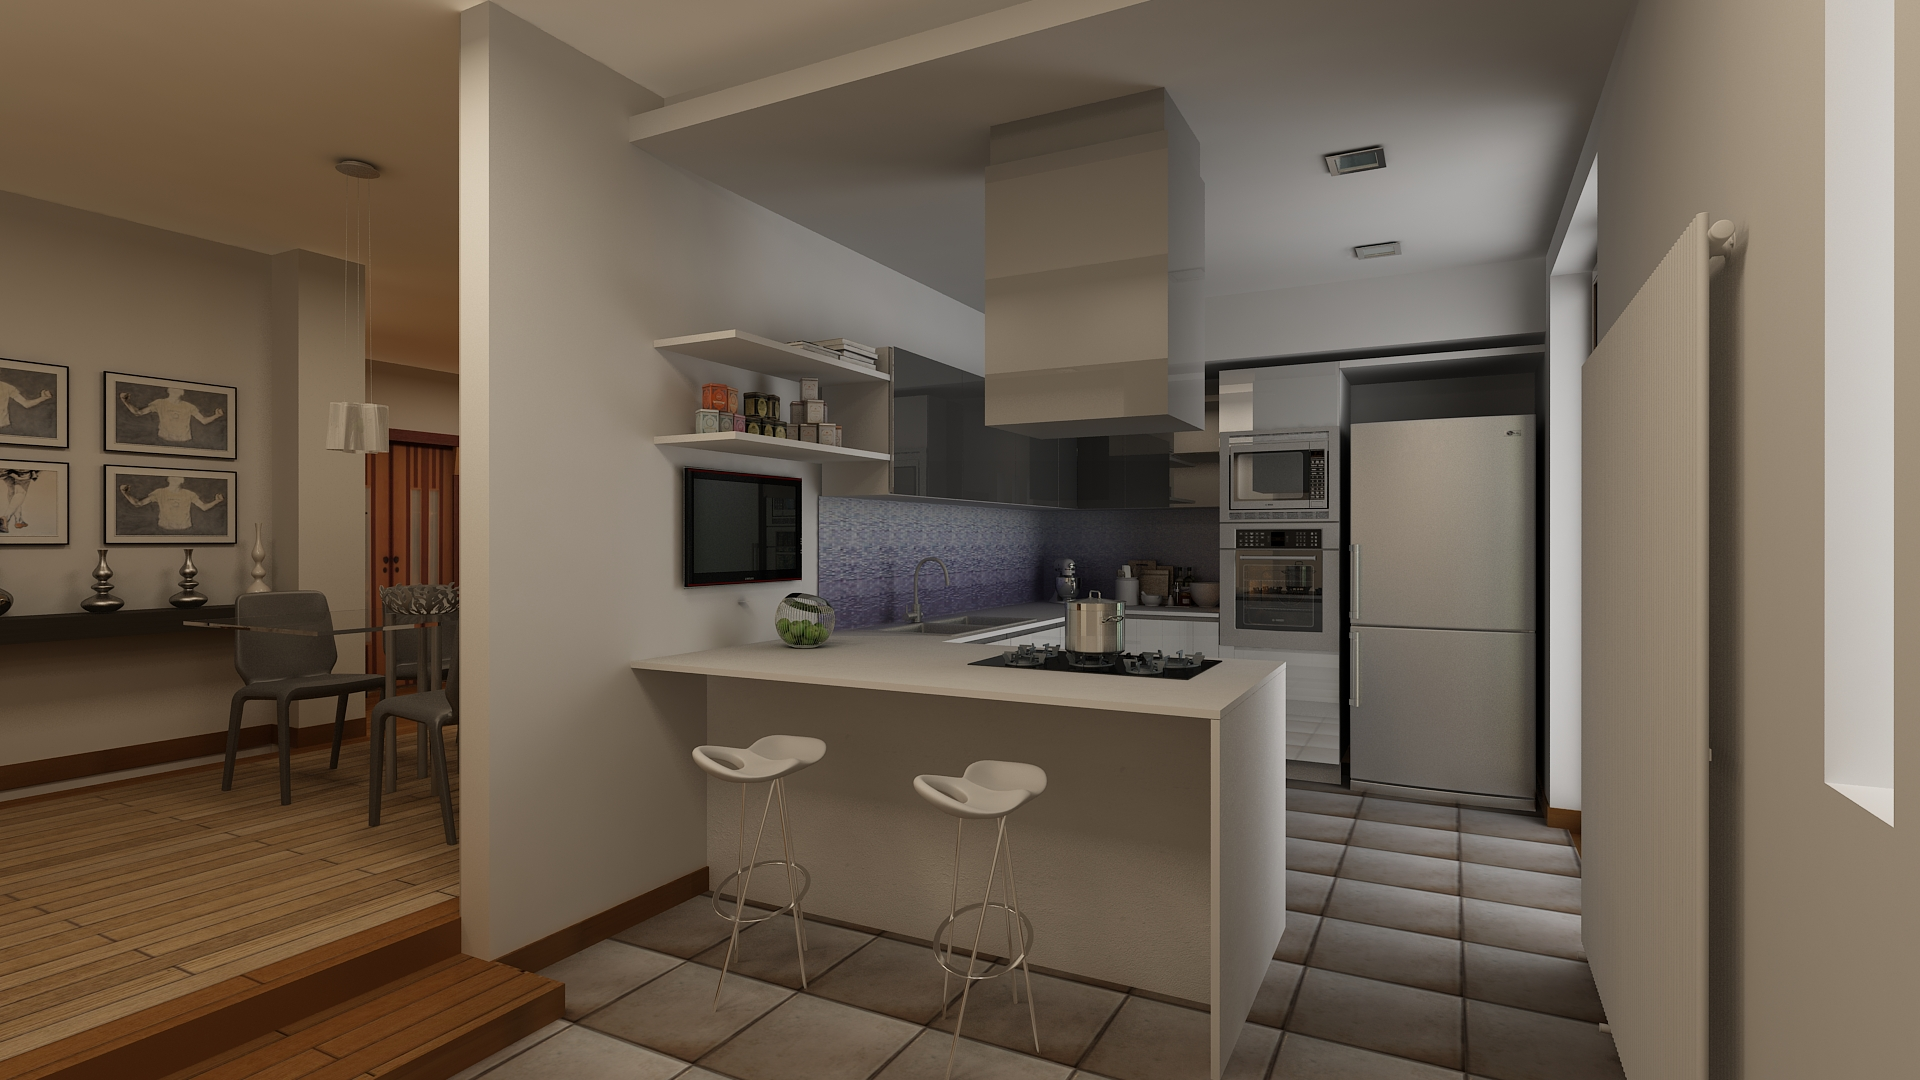 Cucina salone arketipo - Divano in cucina ...